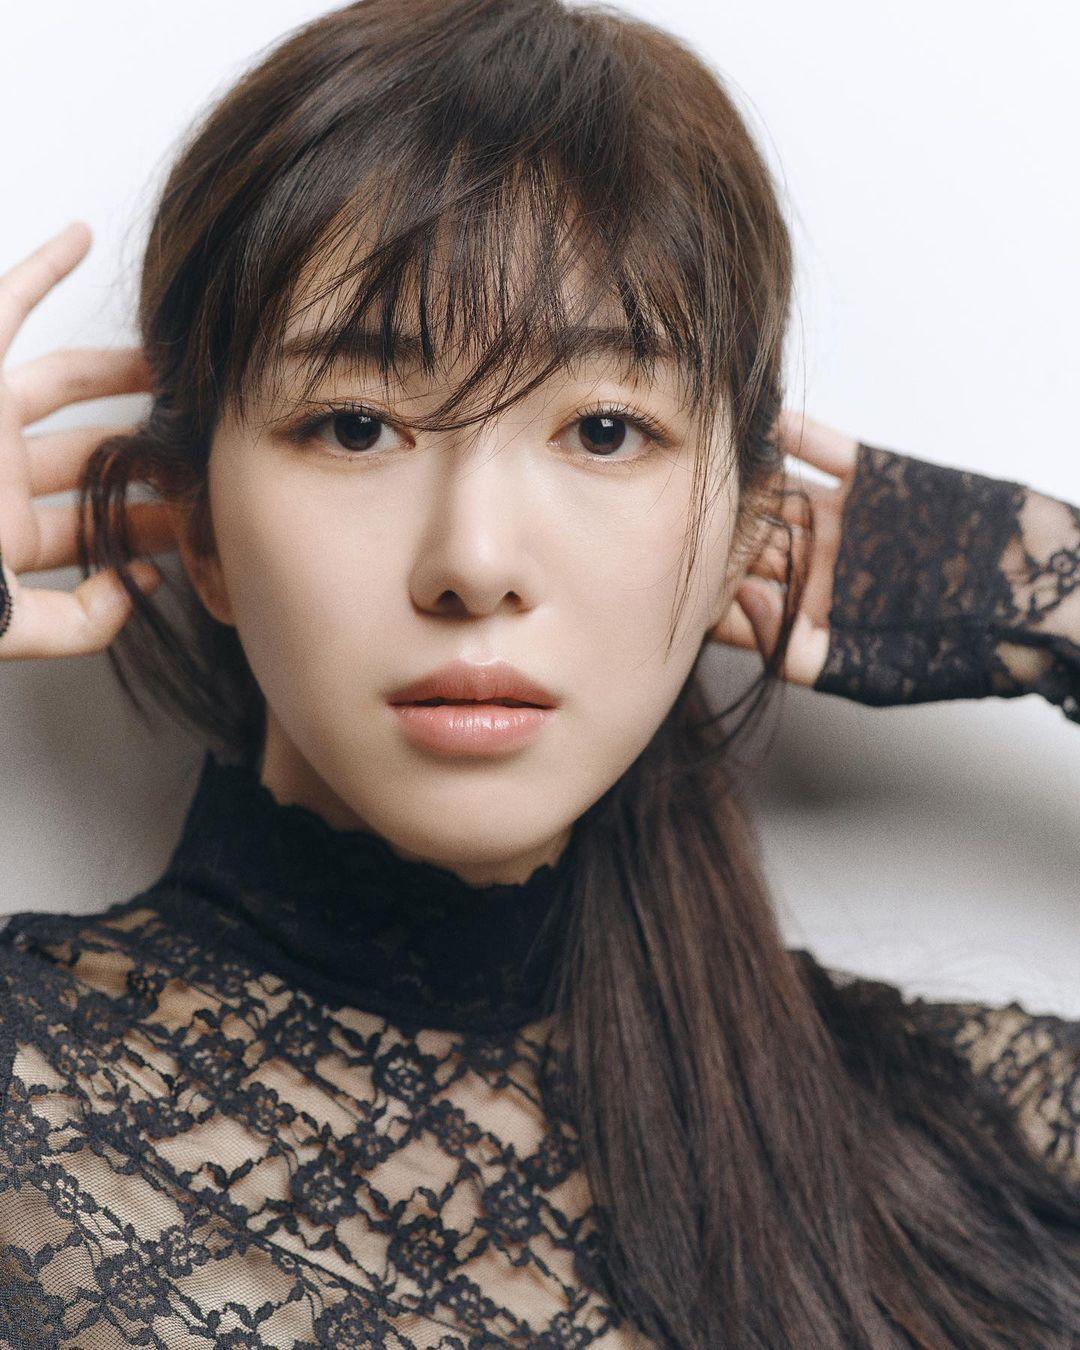 Mina Ex AOA Unggah Luka Sayatan untuk Luapkan Emosi Terhadap Haters